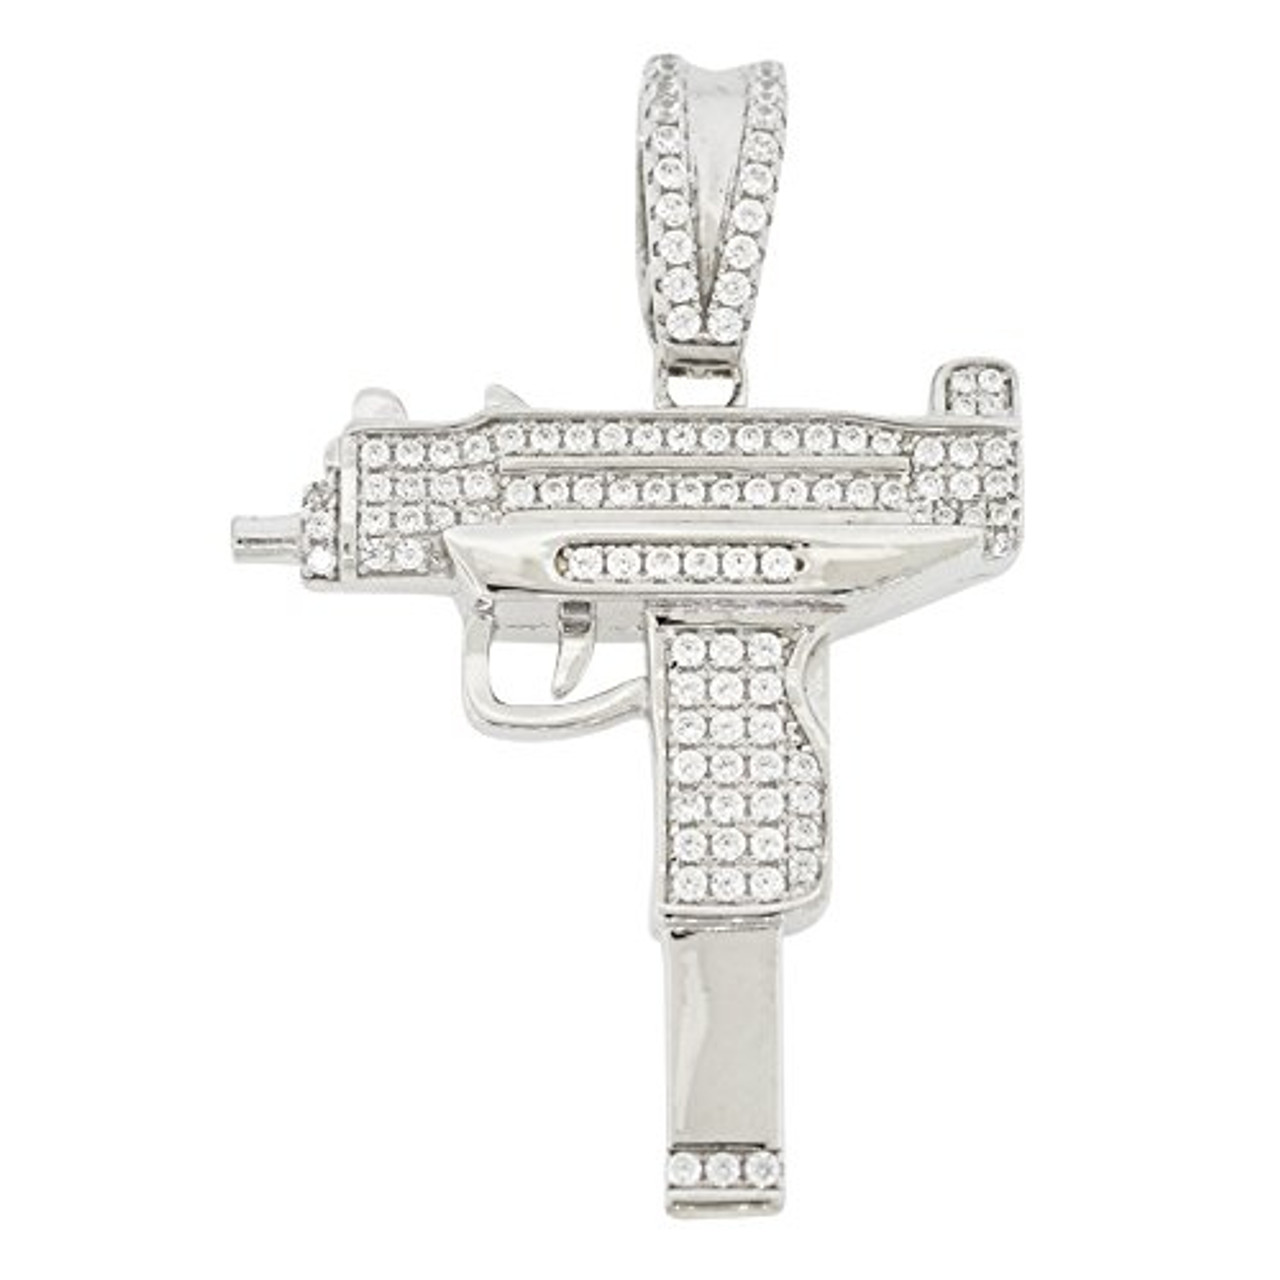 925 Silver Uzi Mac 10 Gun Pendant